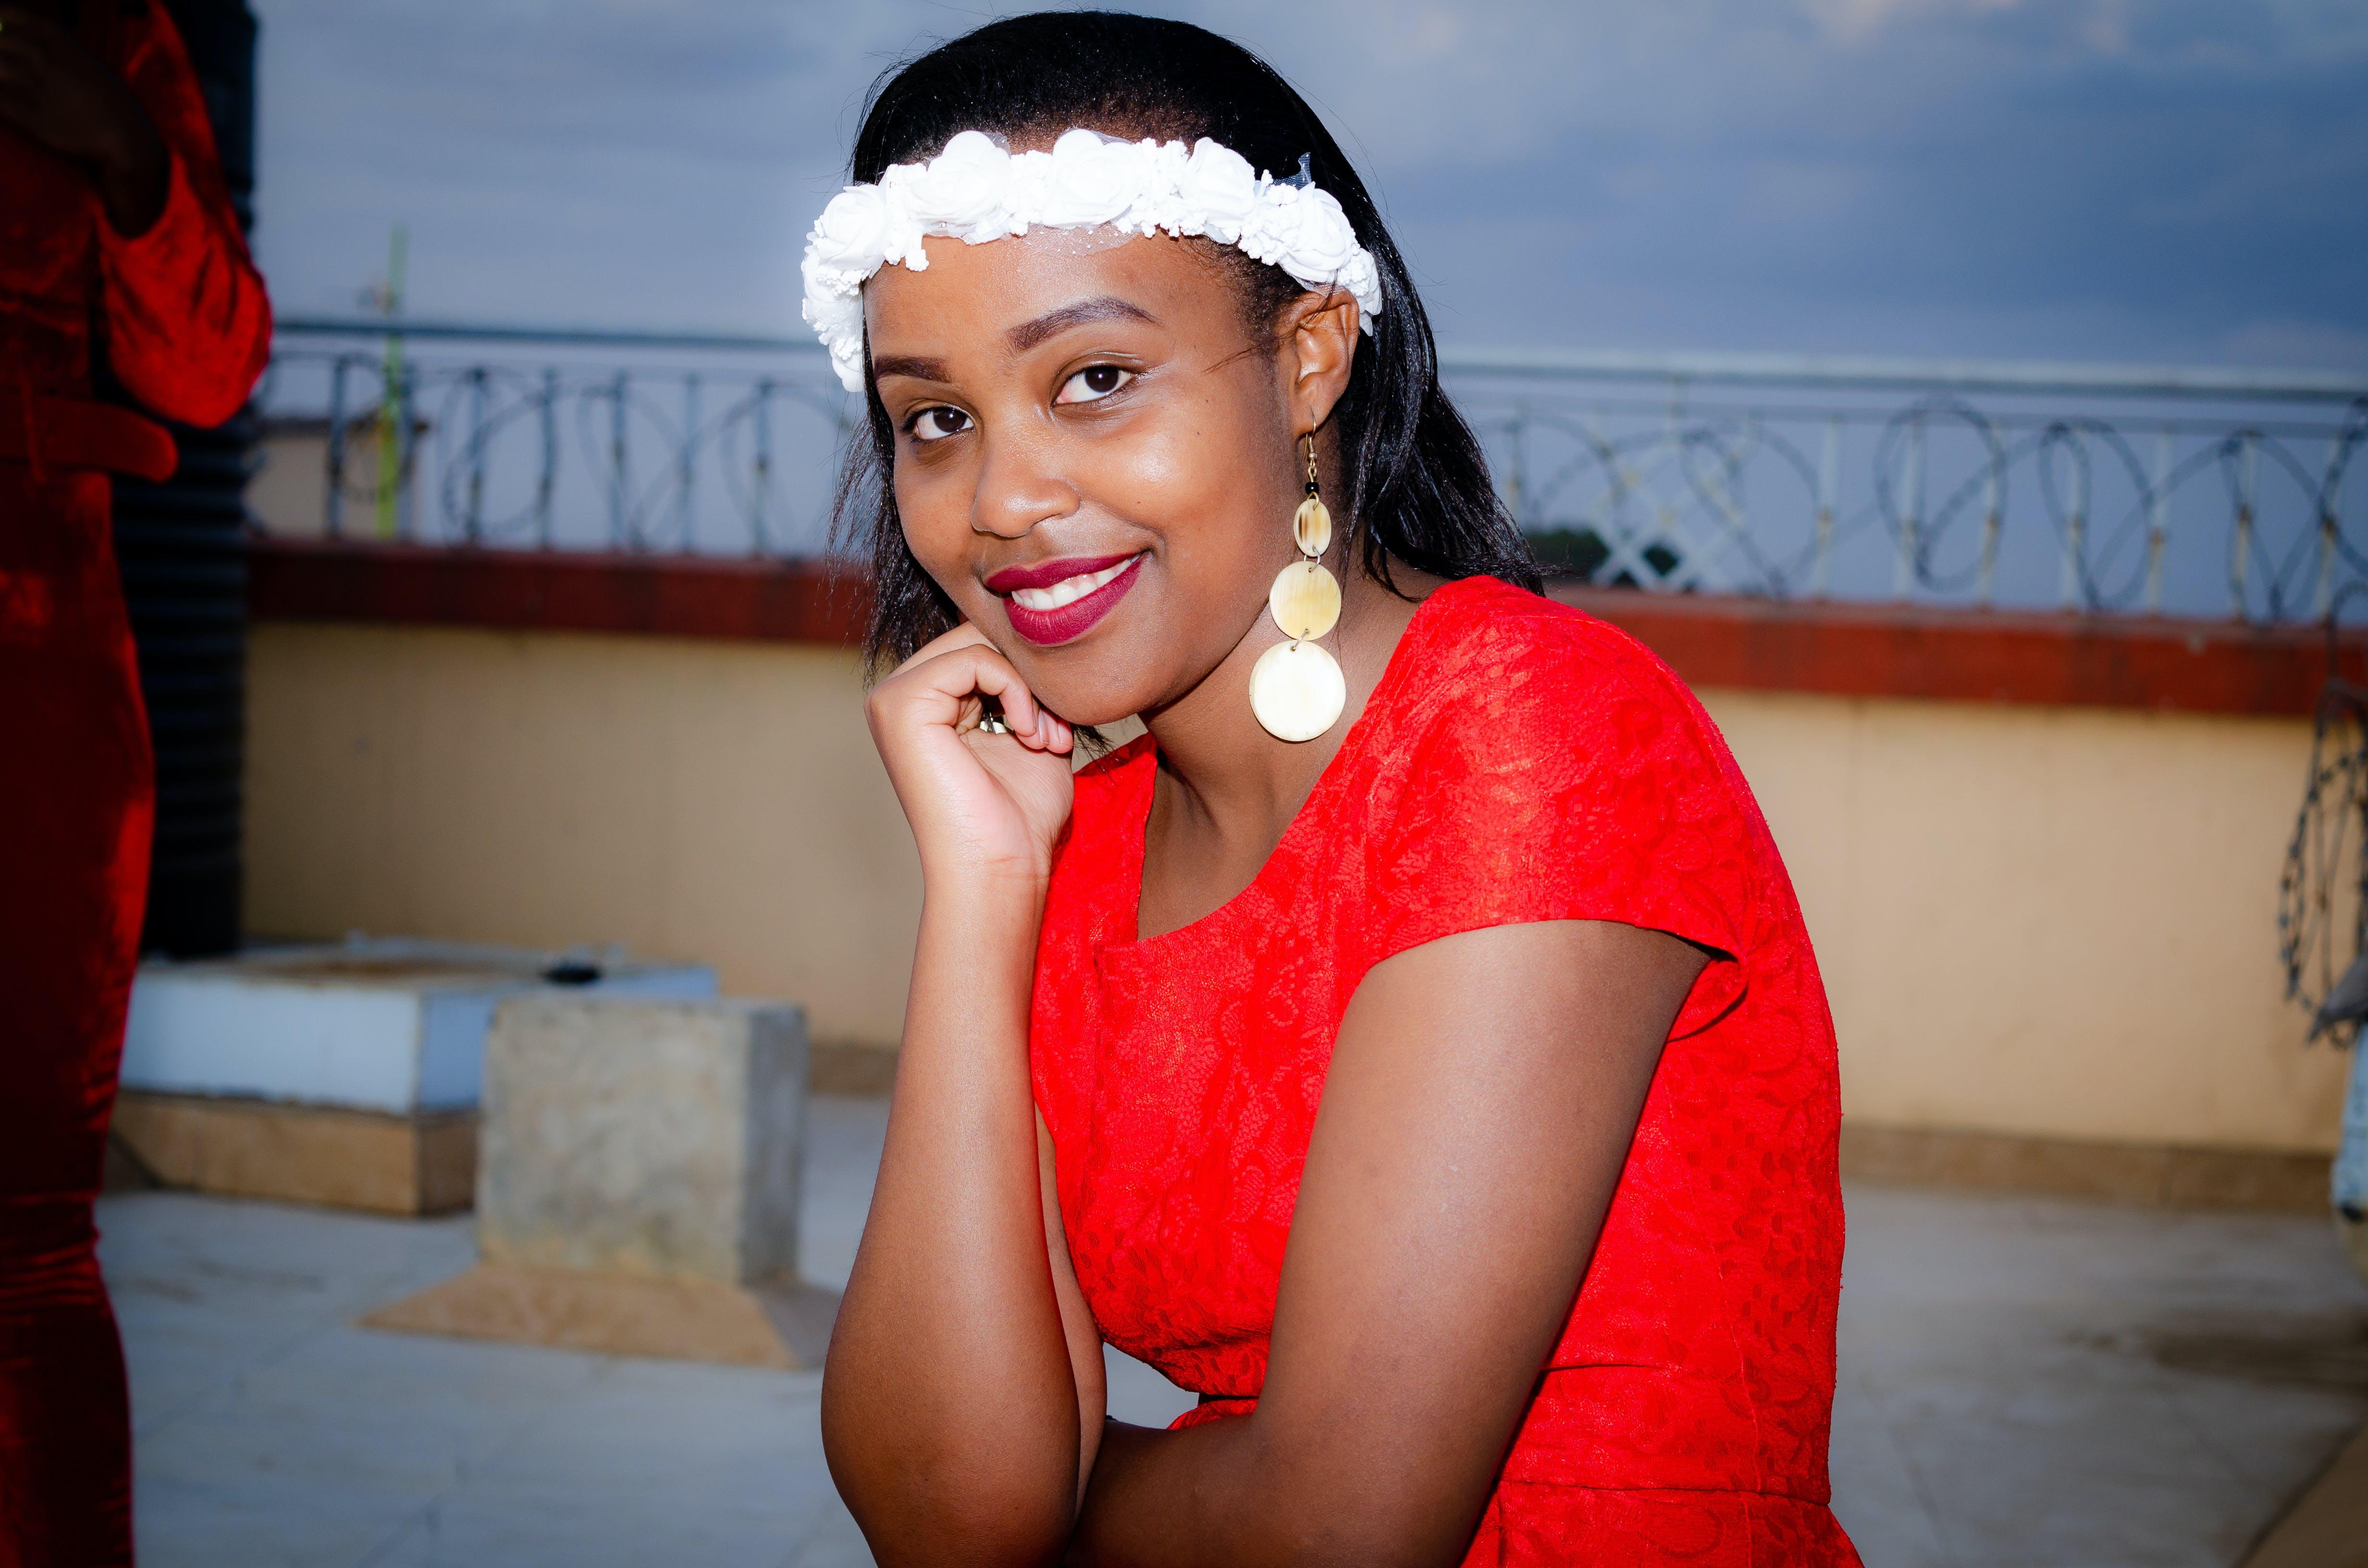 Free stock photo of lipstick, red dress